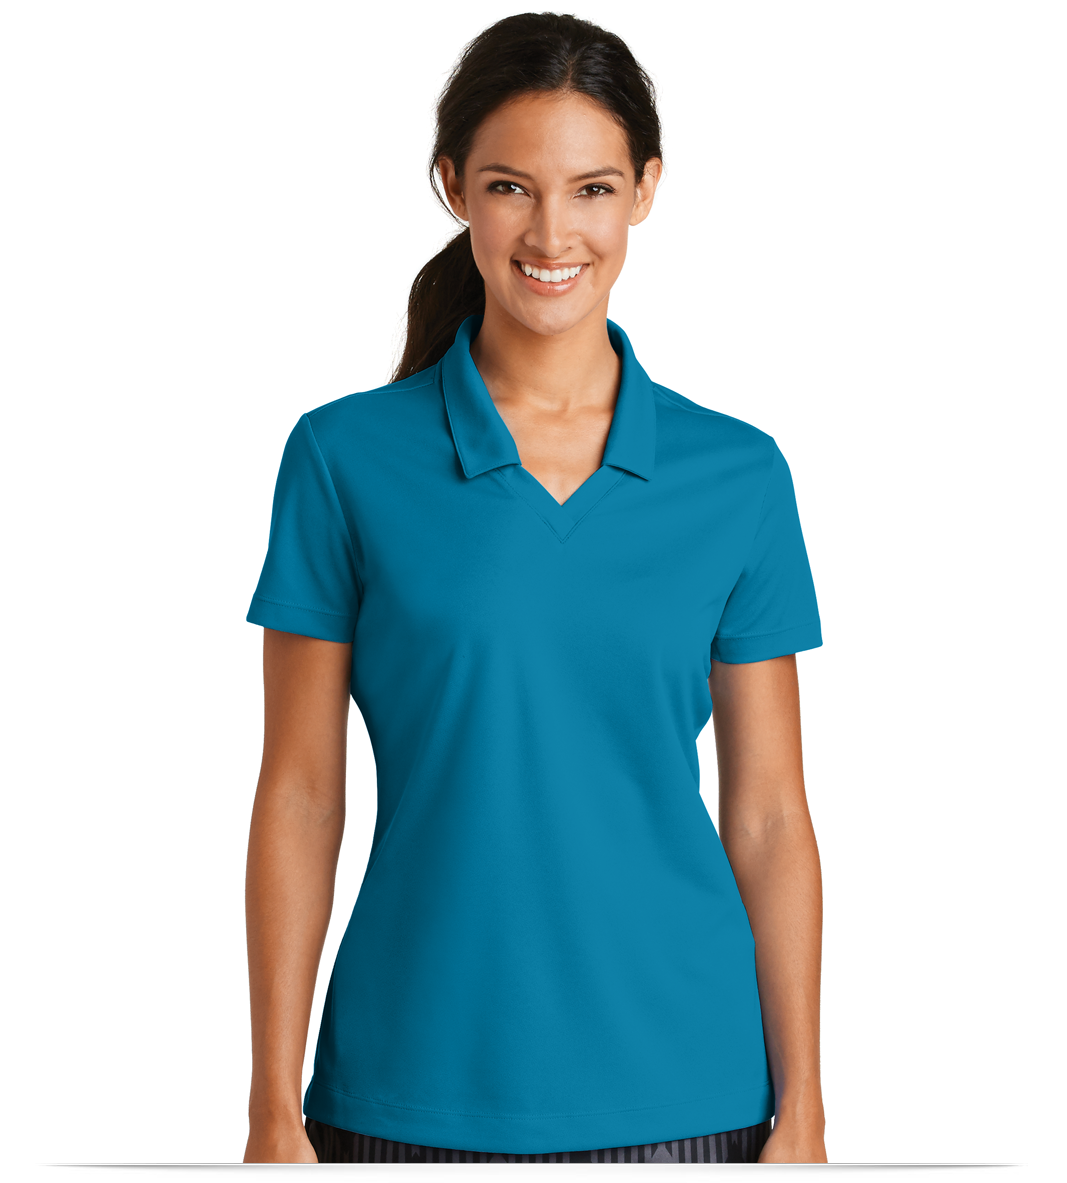 1aca8454cff Design embroidered Women s Nike Golf Shirt online at AllStar Logo